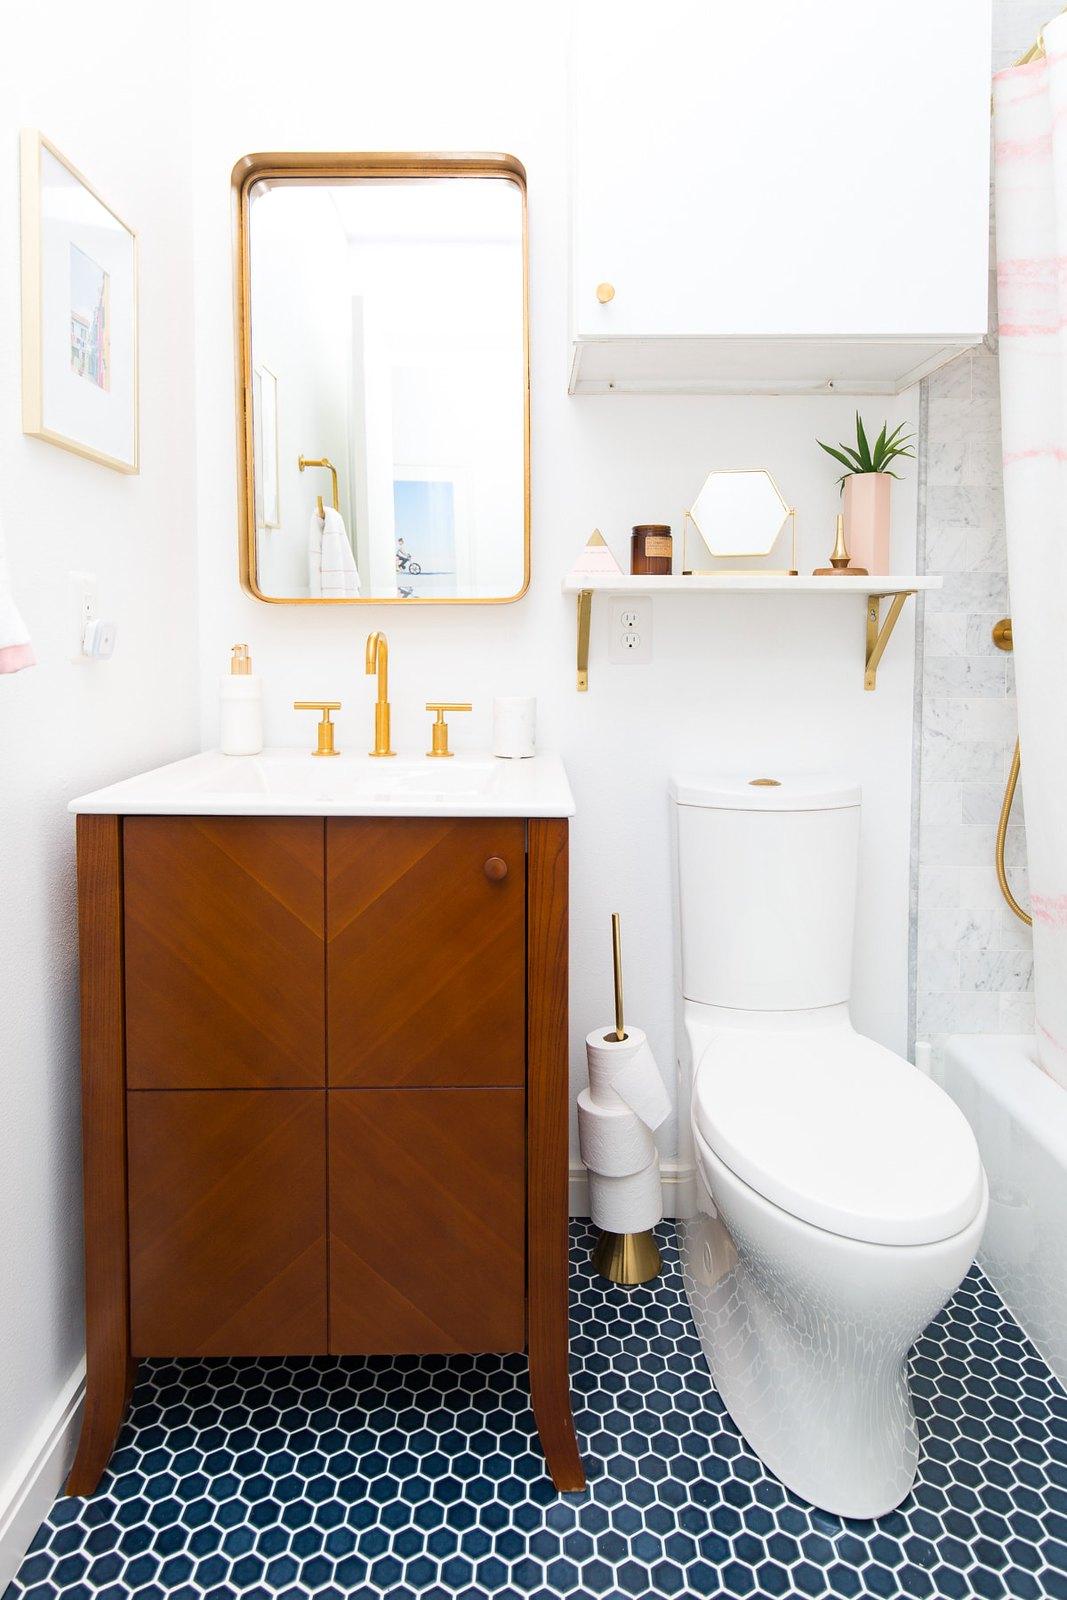 Small Bathrooms Inspiration | Blue Hexagon Floor Tile | Mid Century Modern Bathroom Vanity Cabinet